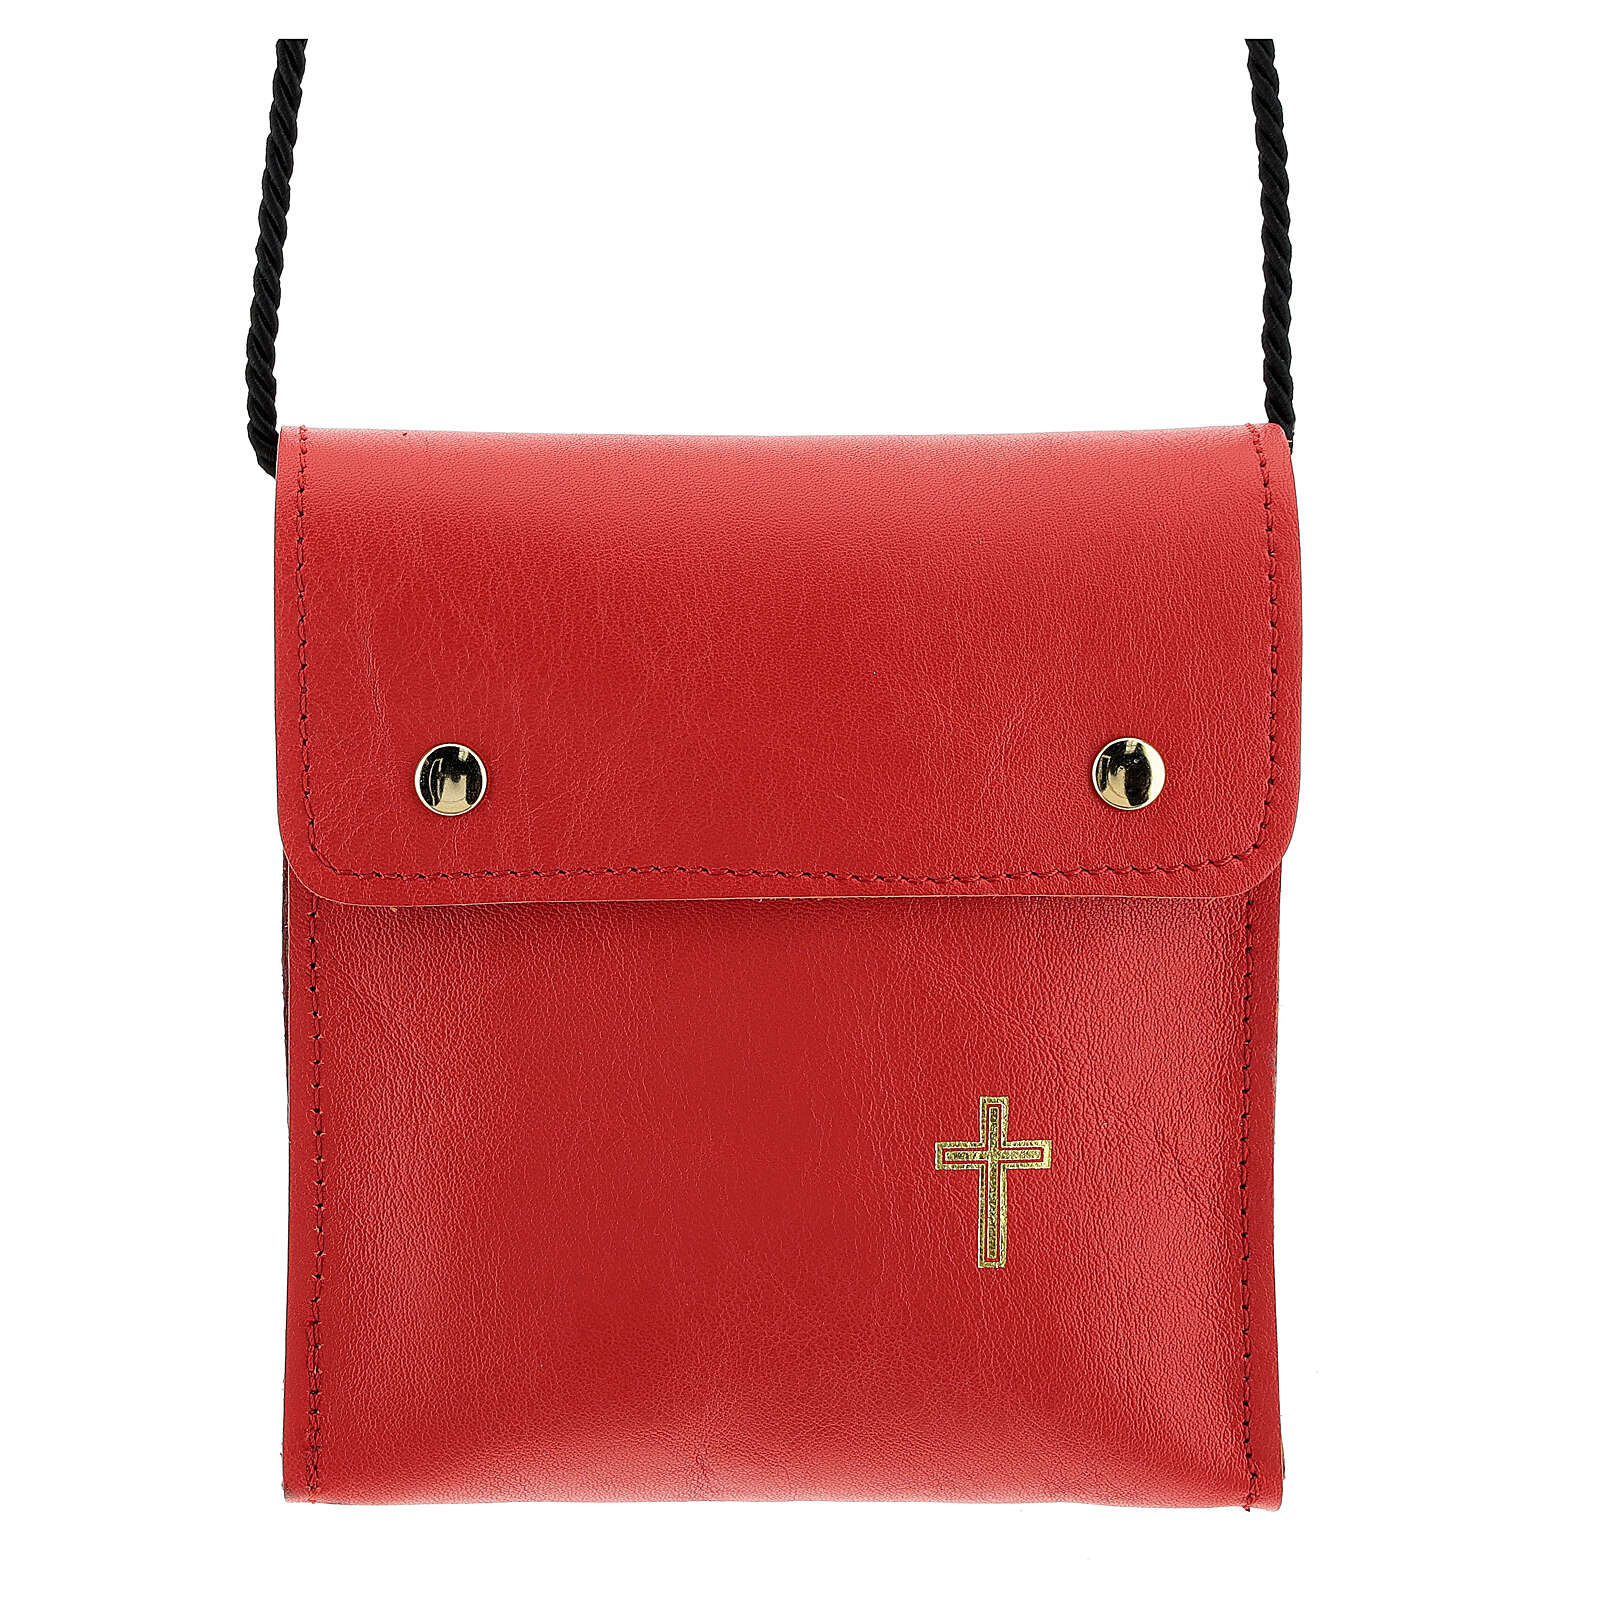 Rectangular paten bag 13x12cm red leather 4